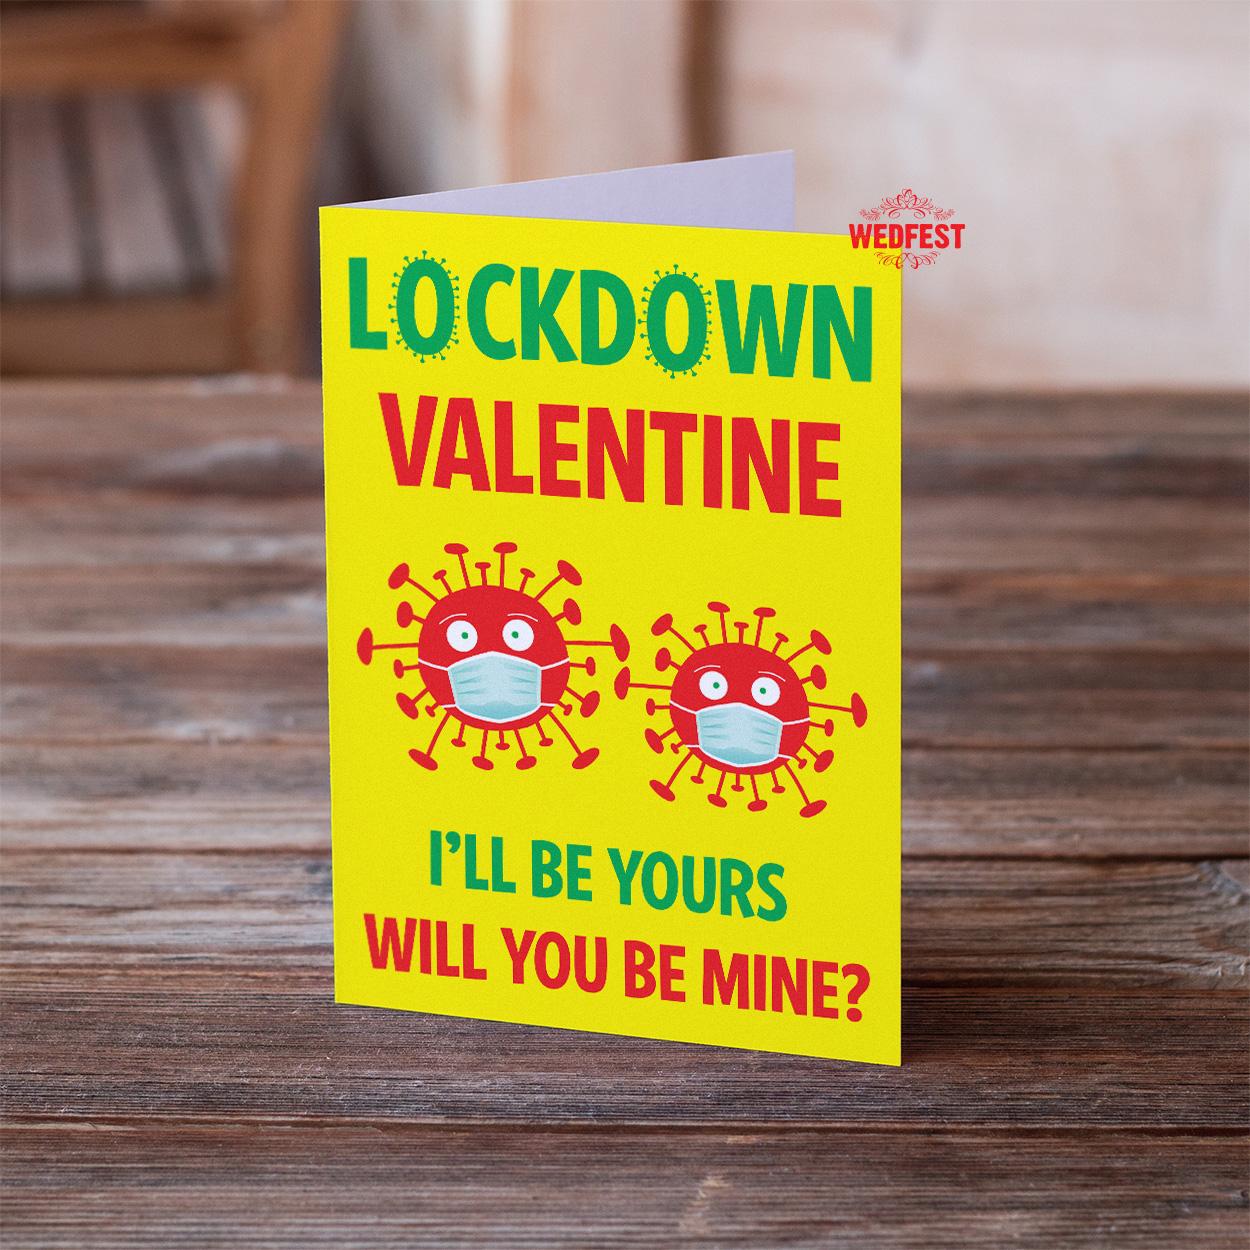 covid coronavirus lockdown valentines day card